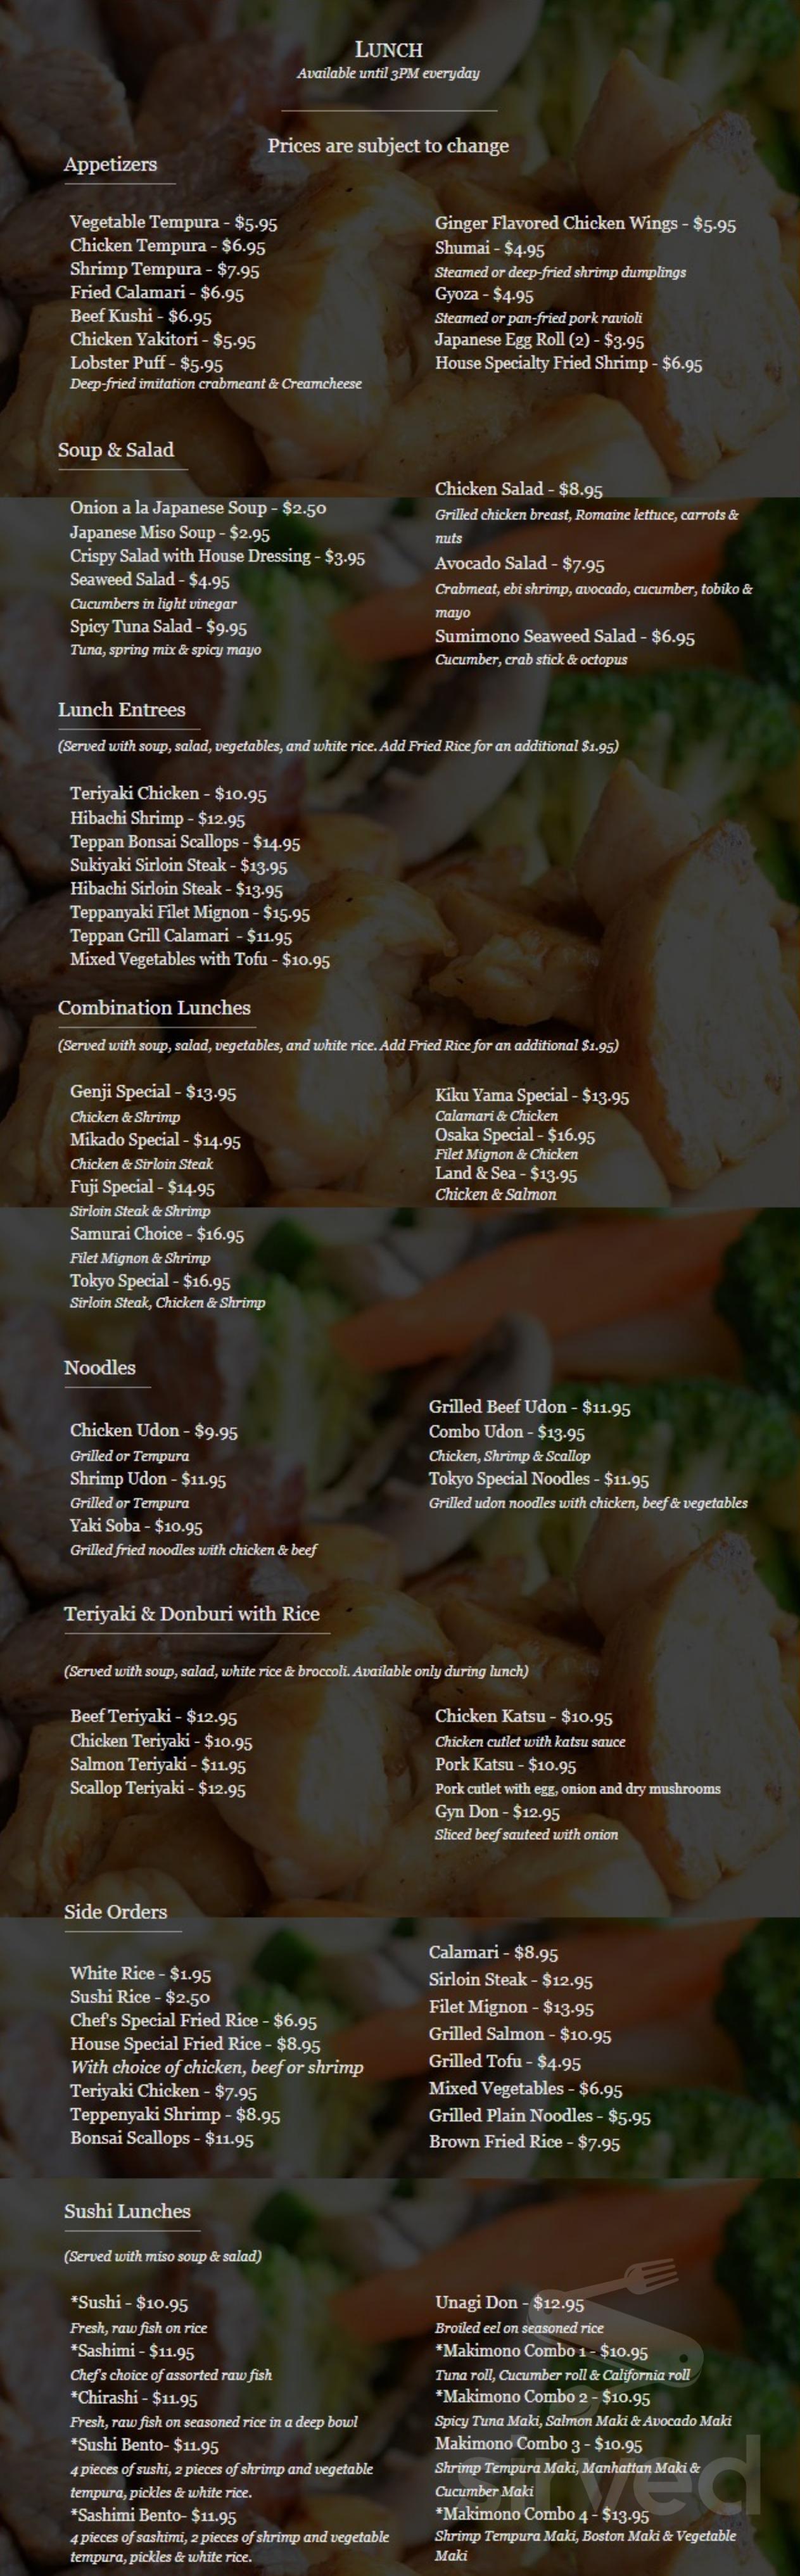 Tremendous Menu For Tokyo Steakhouse In Salem New Hampshire Usa Download Free Architecture Designs Scobabritishbridgeorg